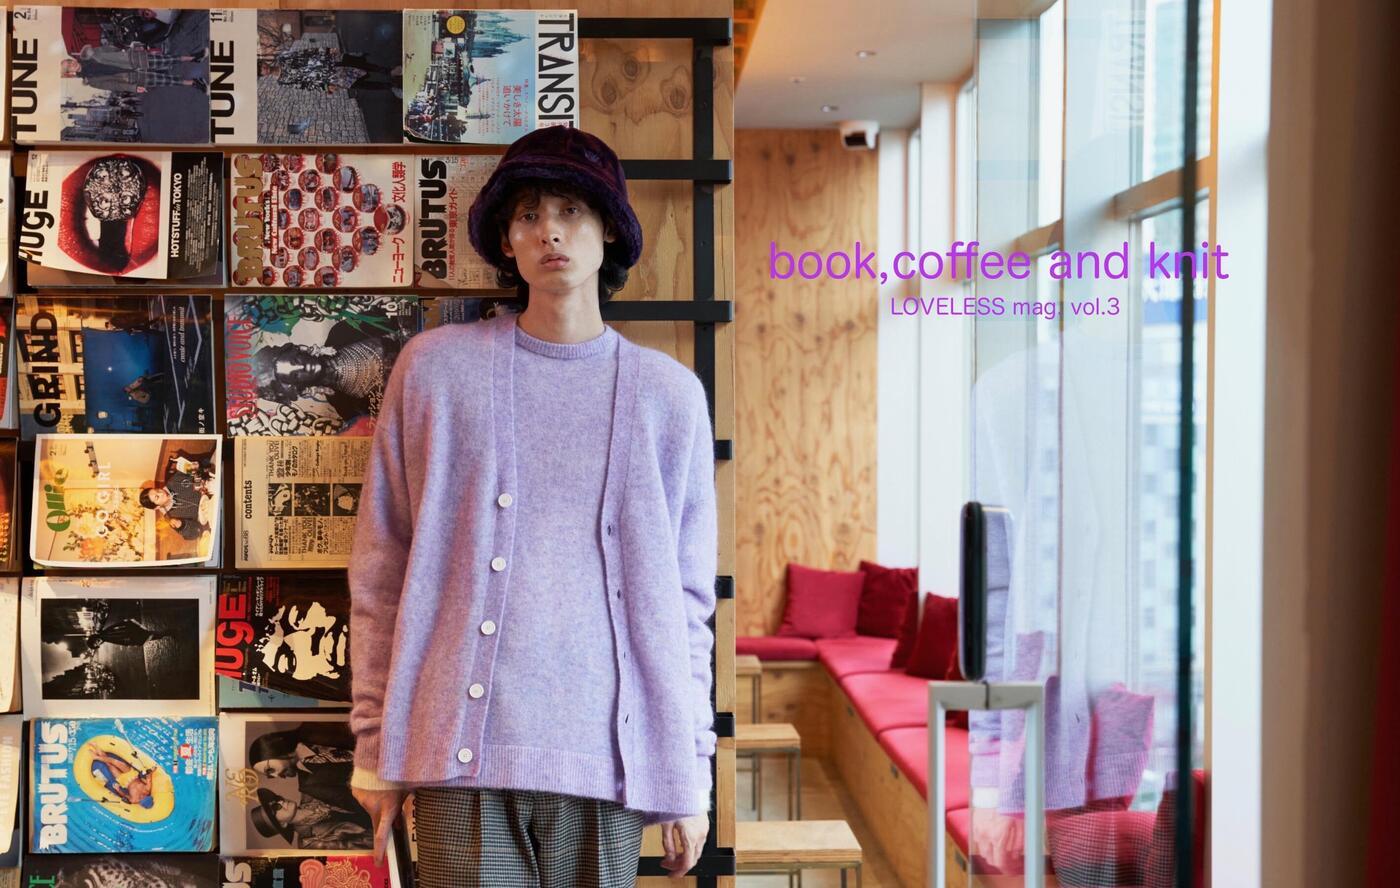 【LOVELESS mag.vol2】「本とコーヒー、そしてニット」2021秋、買うべきニット